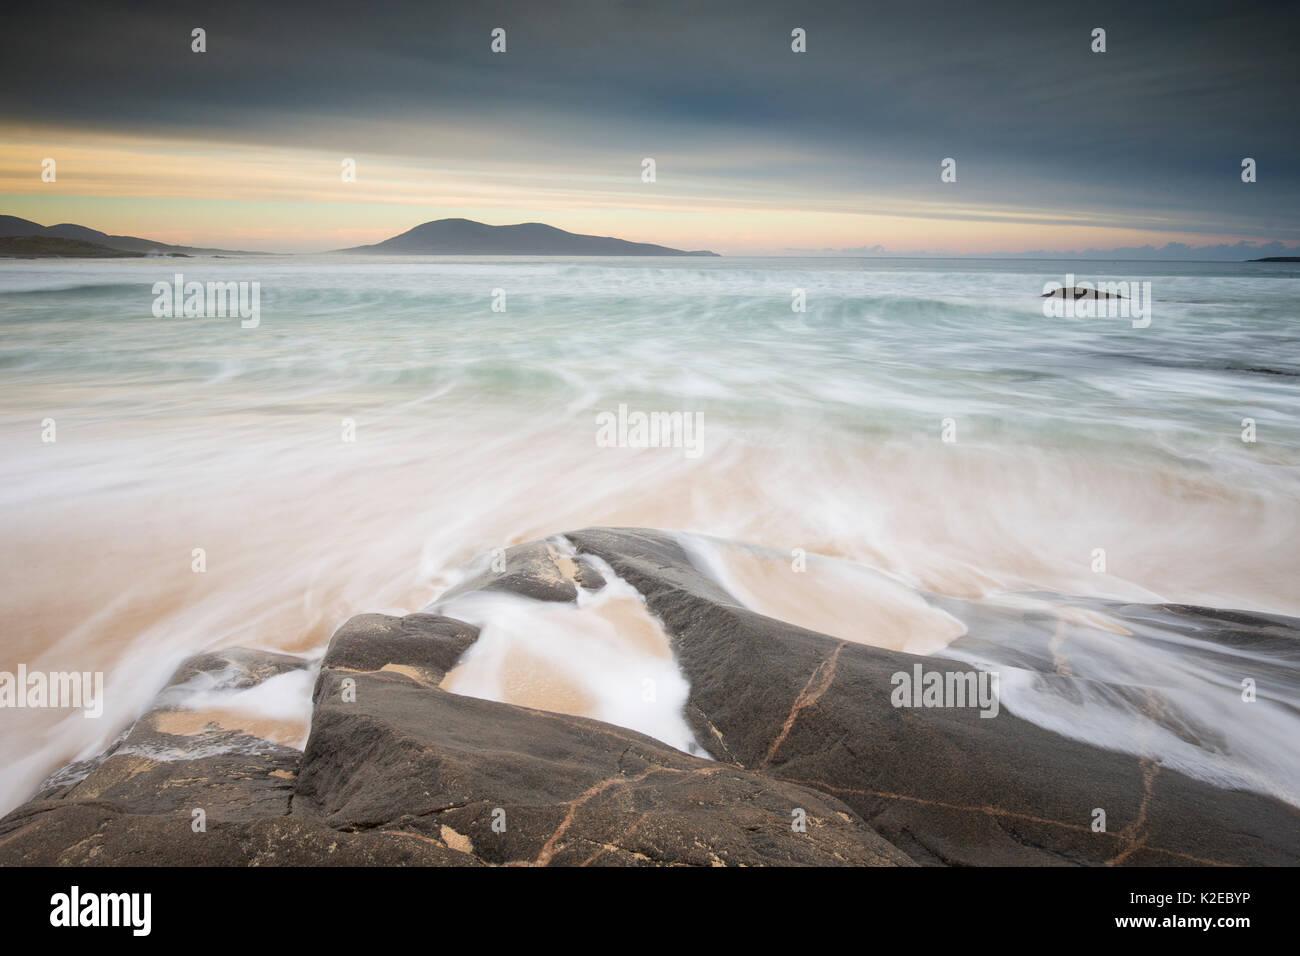 Dawn across Sound of Taransay towards Toe Head, West Harris, Outer Hebrides, Scotland, UK, October 2014. - Stock Image